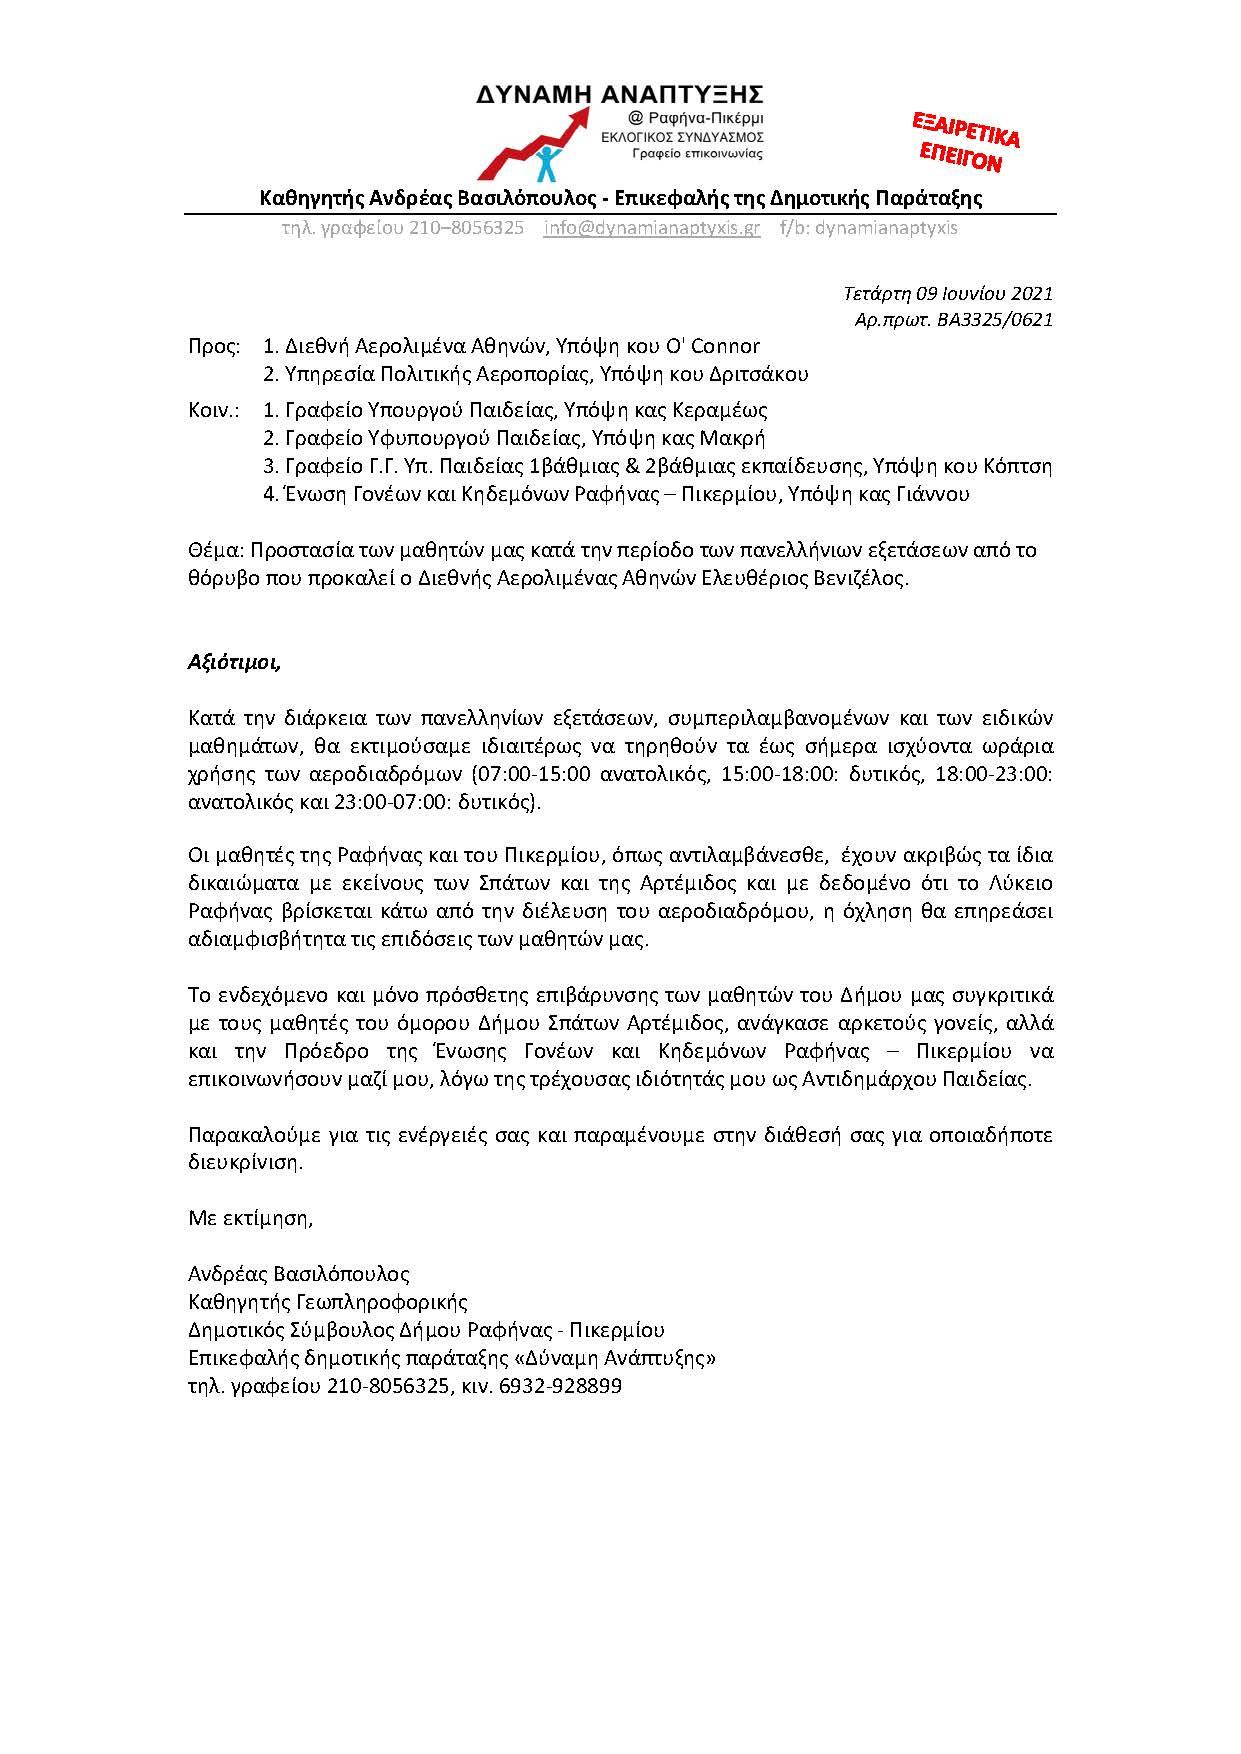 VASSILOPOULOS_AERODROMIO_SPATON